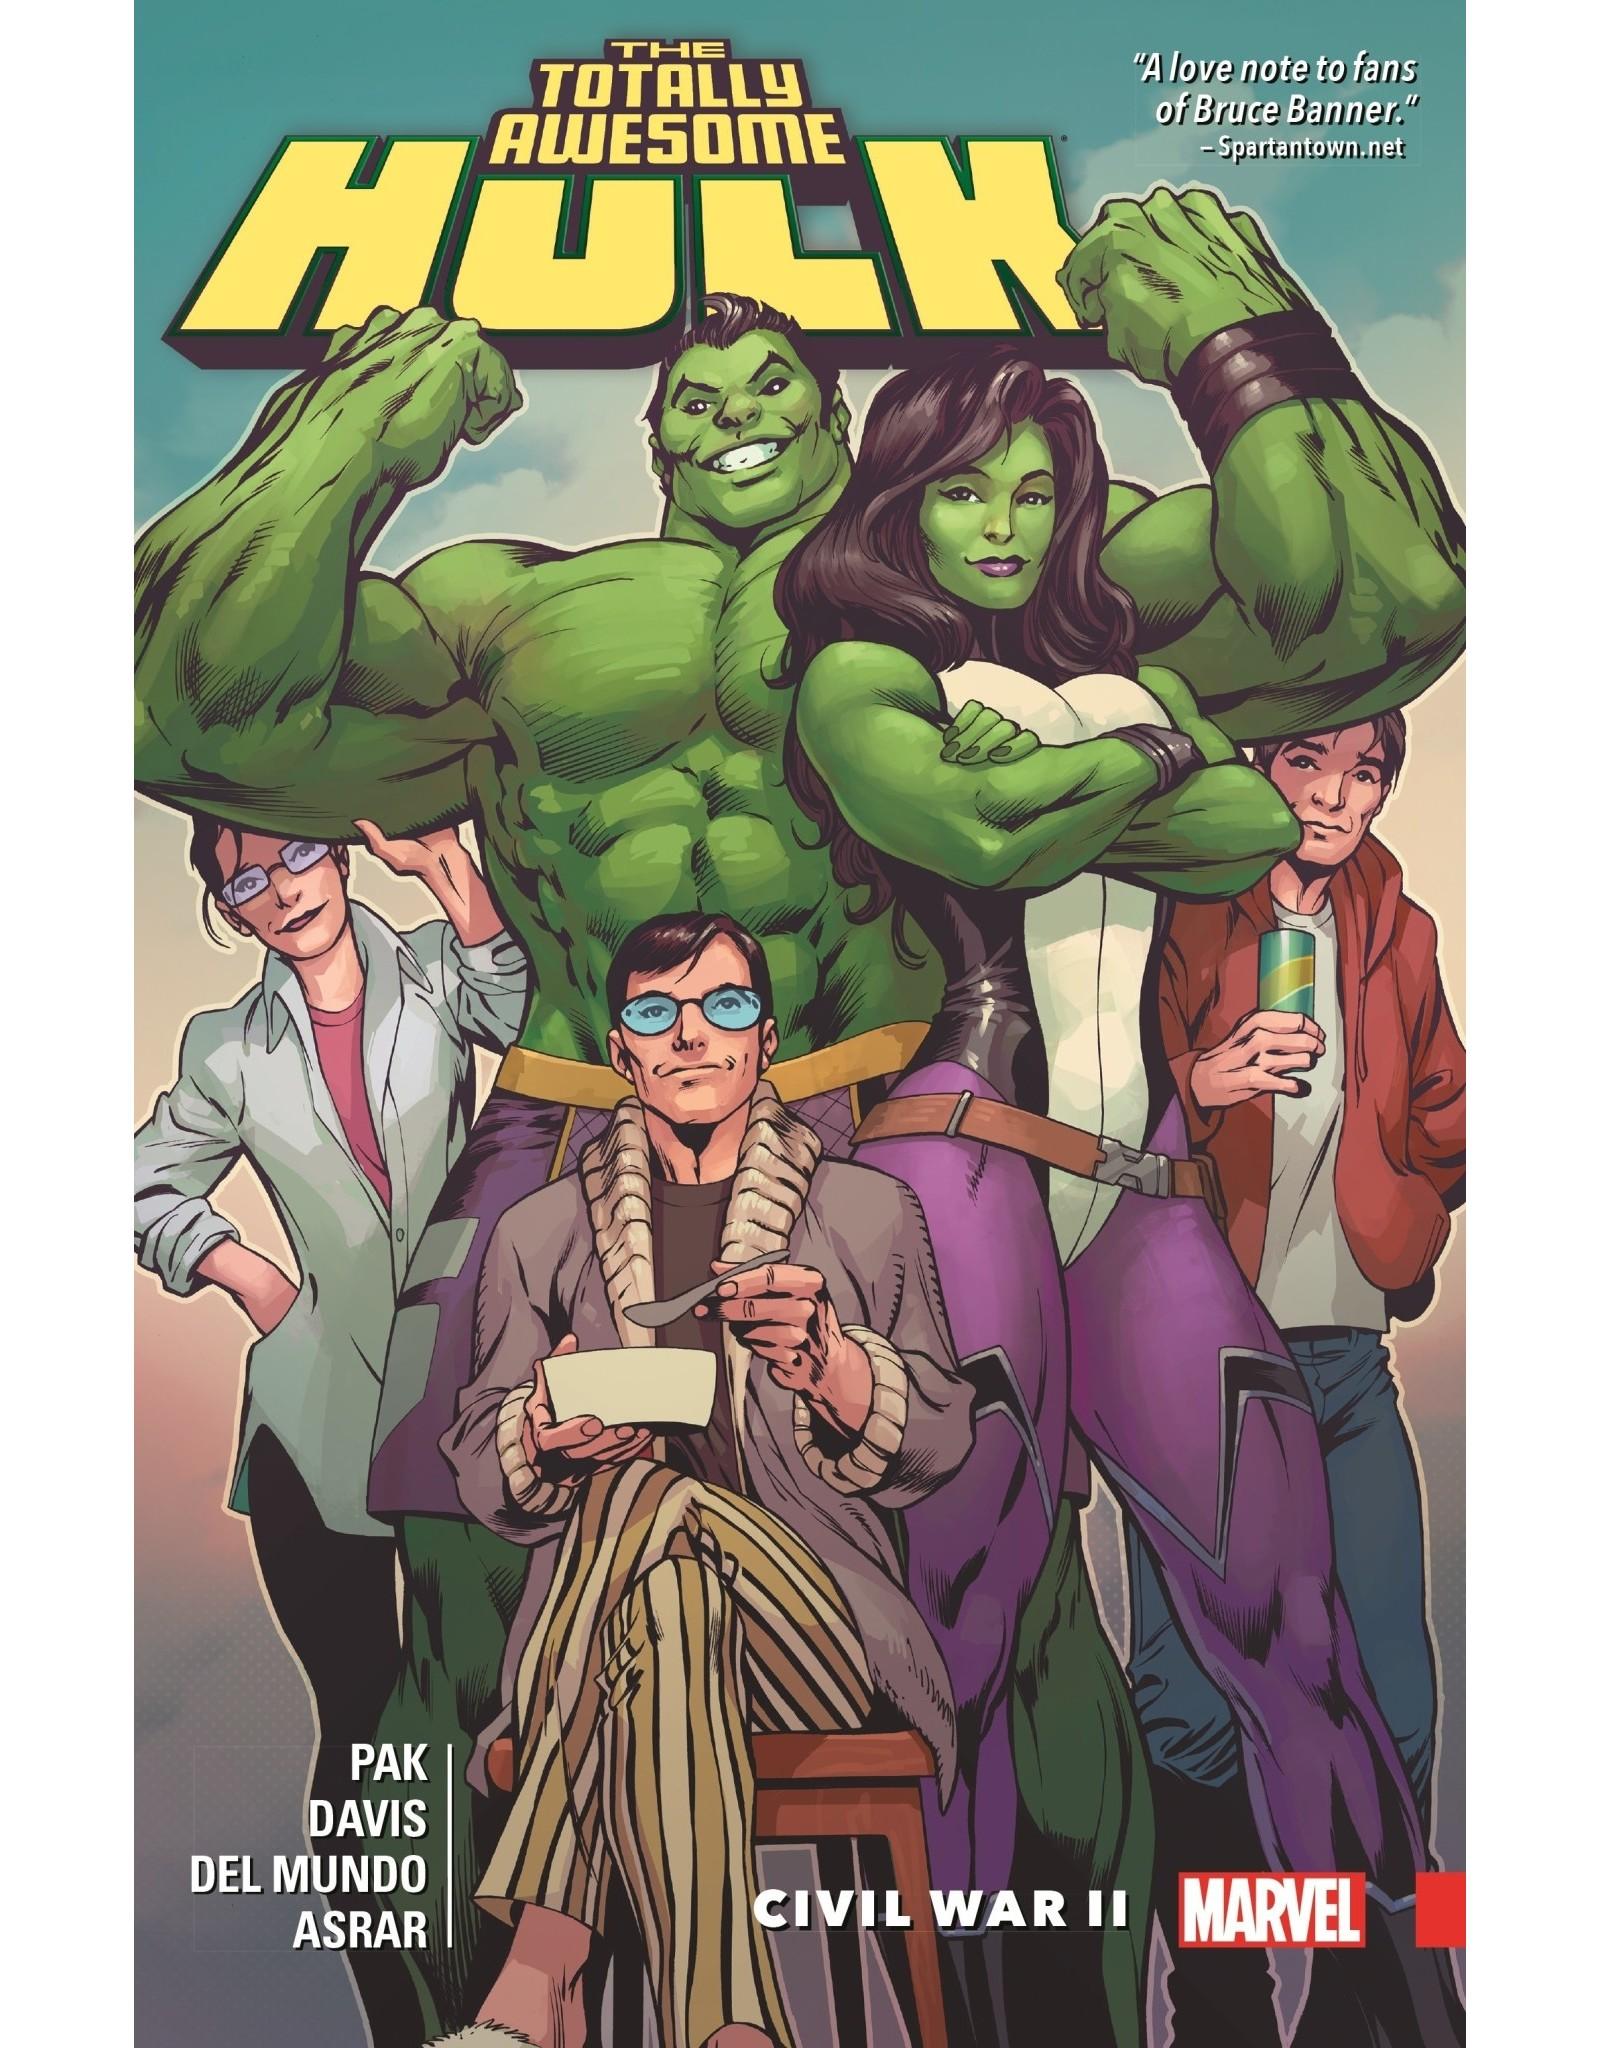 MARVEL COMICS TOTALLY AWESOME HULK VOLUME 02 CIVIL WAR II TRADE PAPERBACK